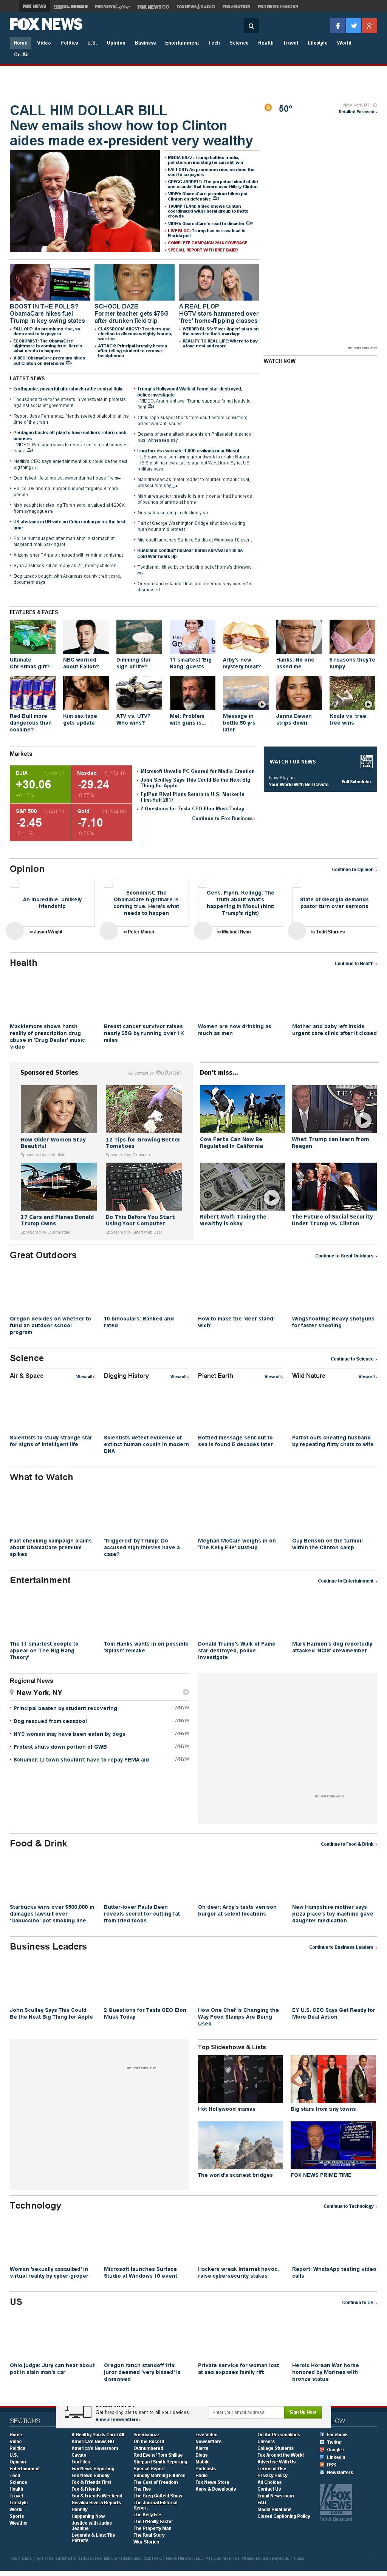 Fox News at Wednesday Oct. 26, 2016, 8:05 p.m. UTC